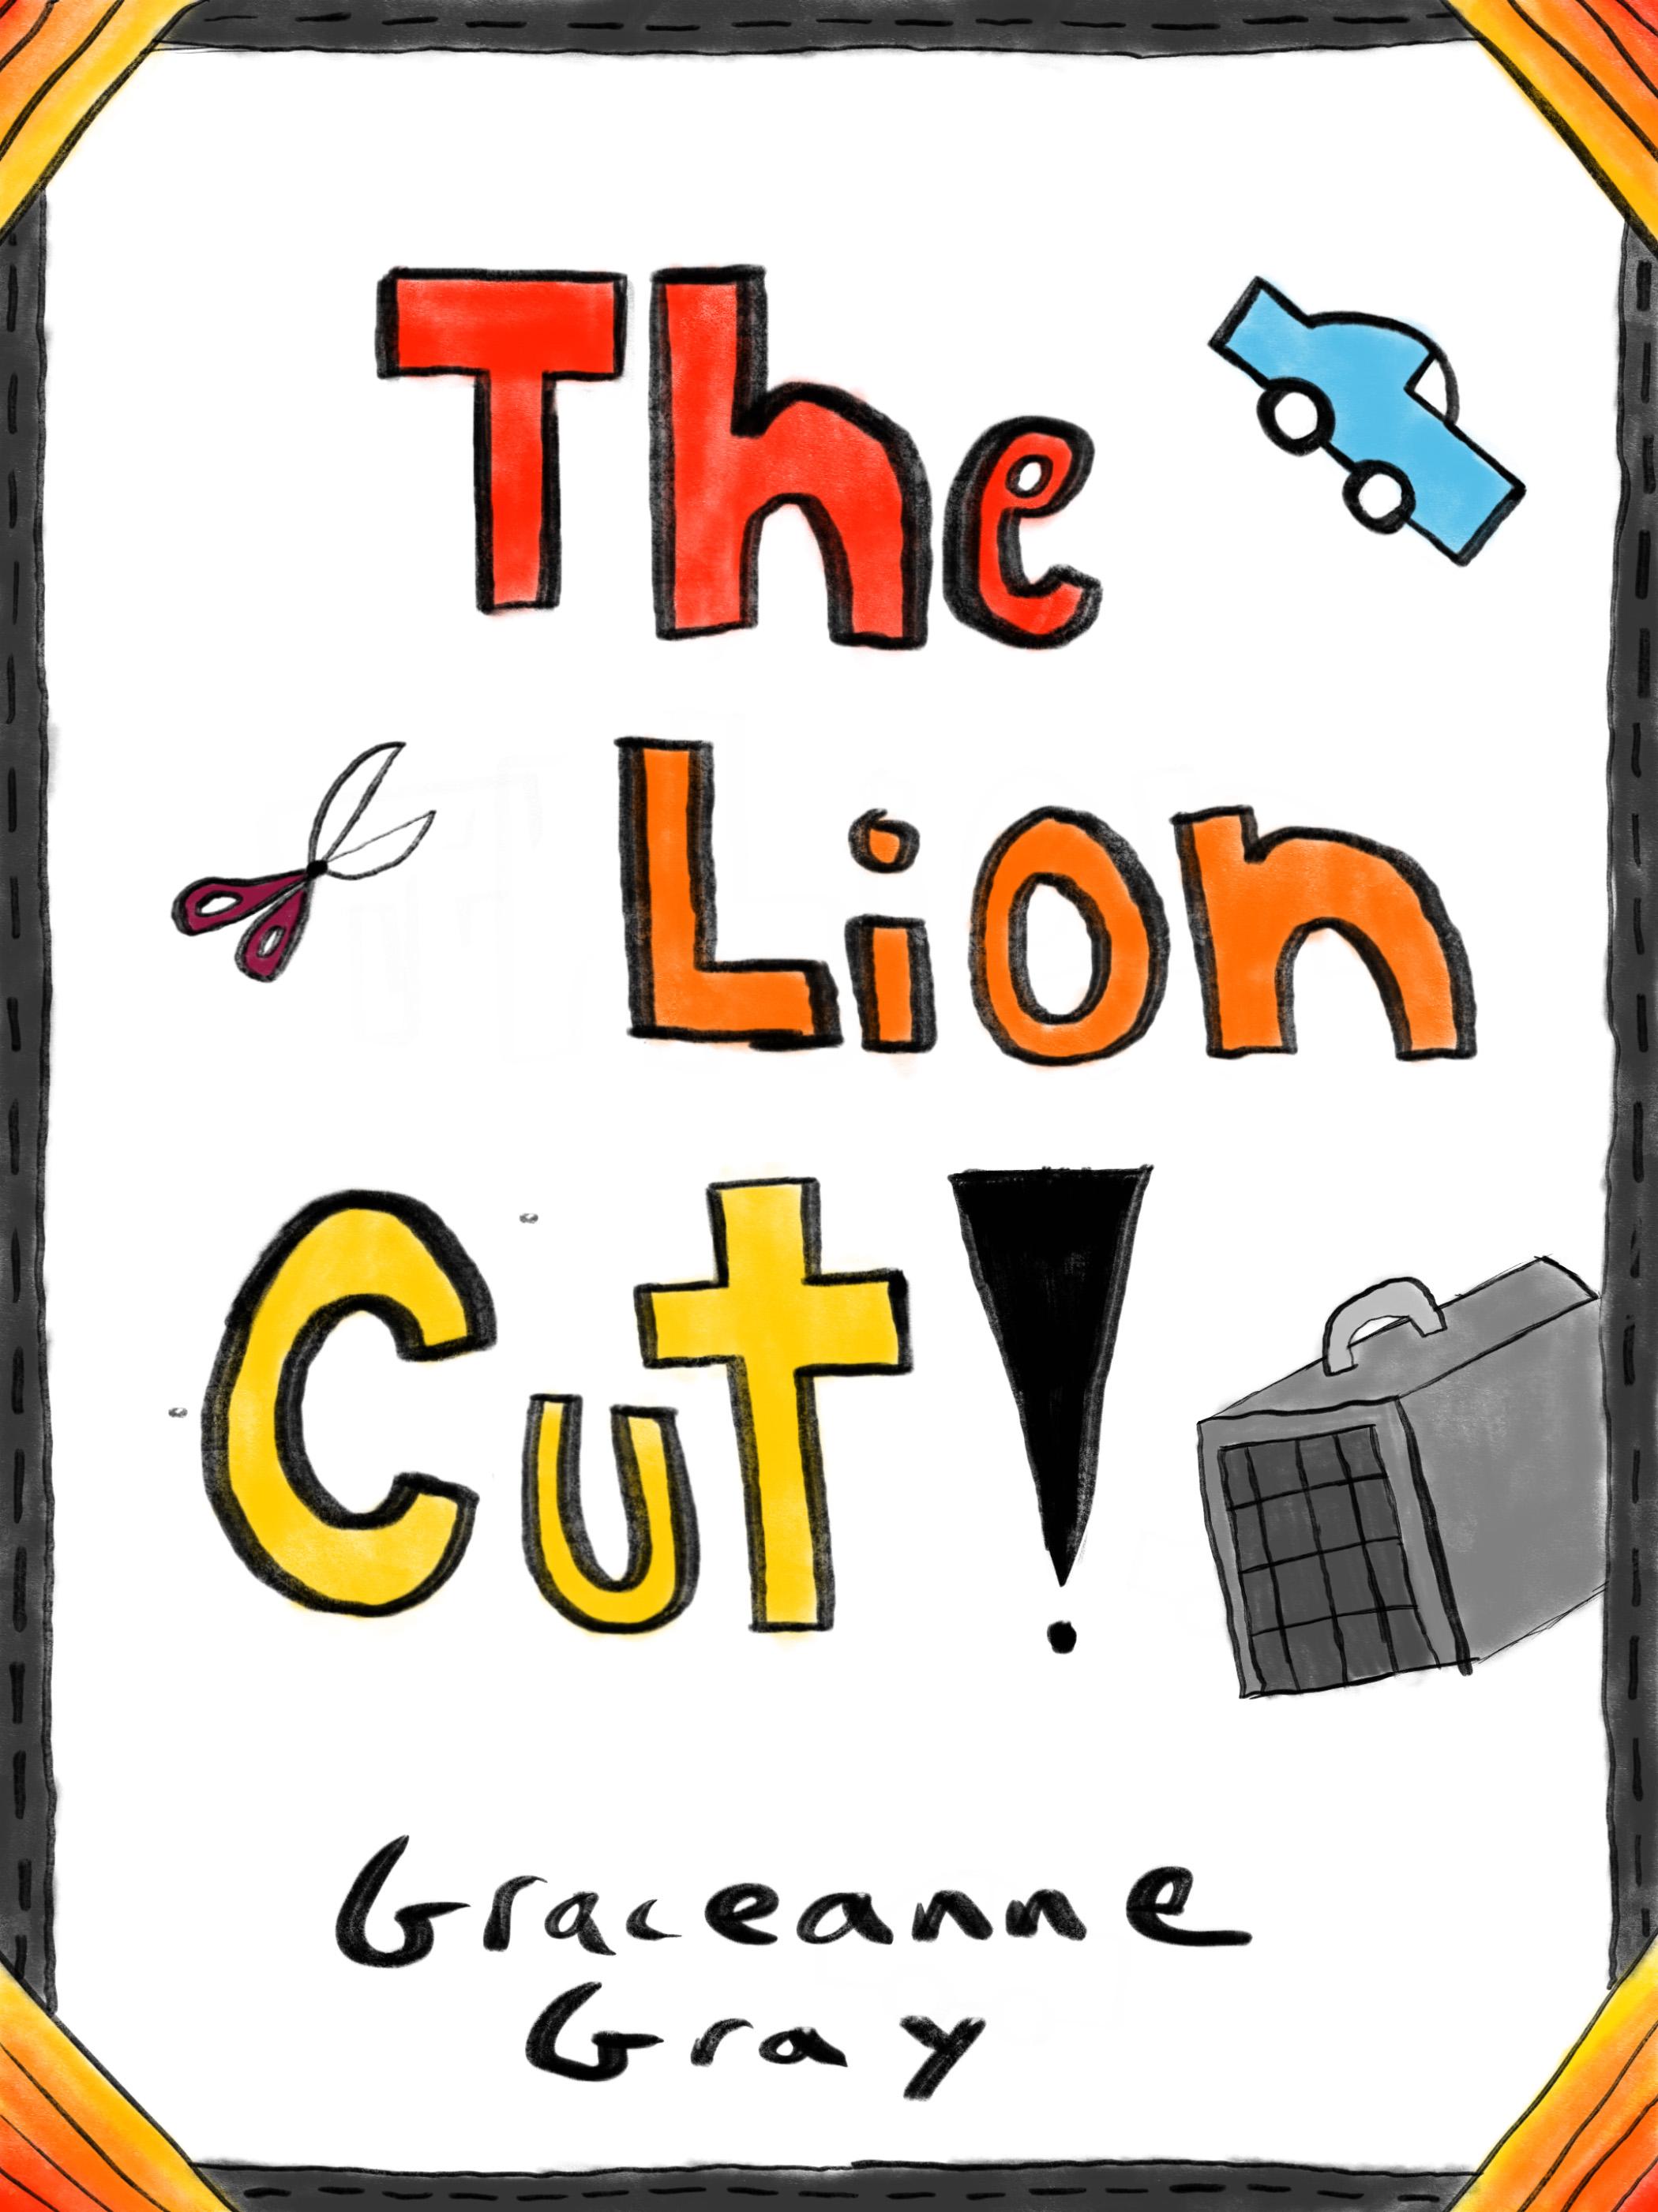 The Lion Cut    by Graceanne Gray